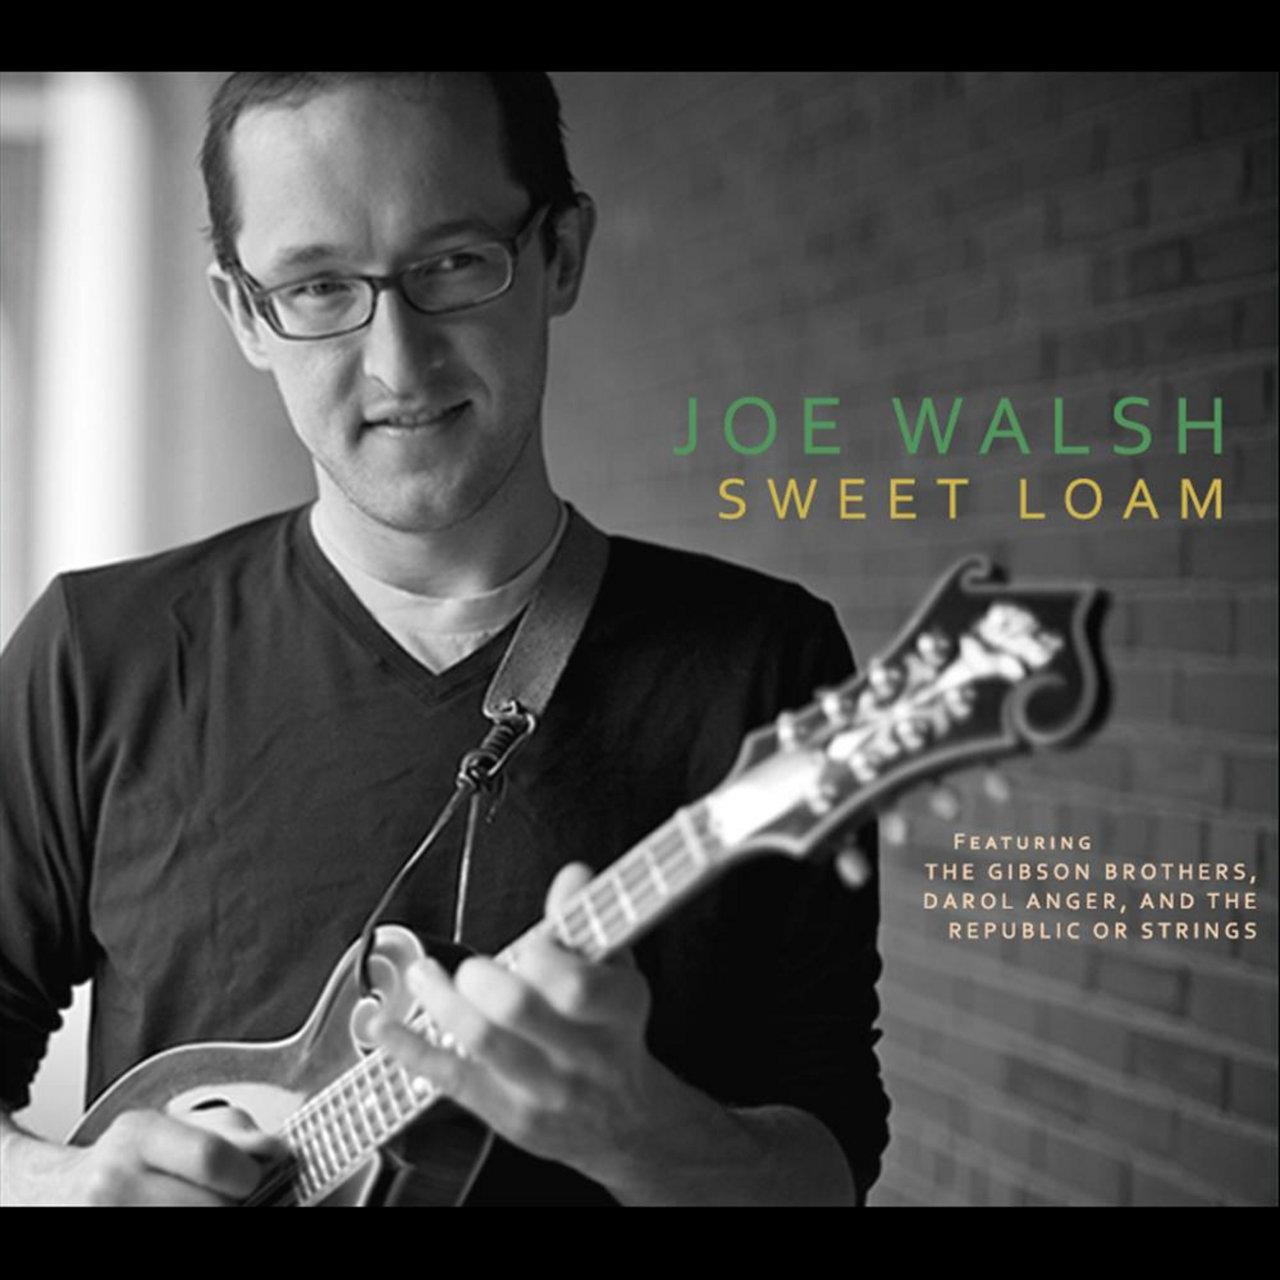 Joe walsh rocky mountain way free download